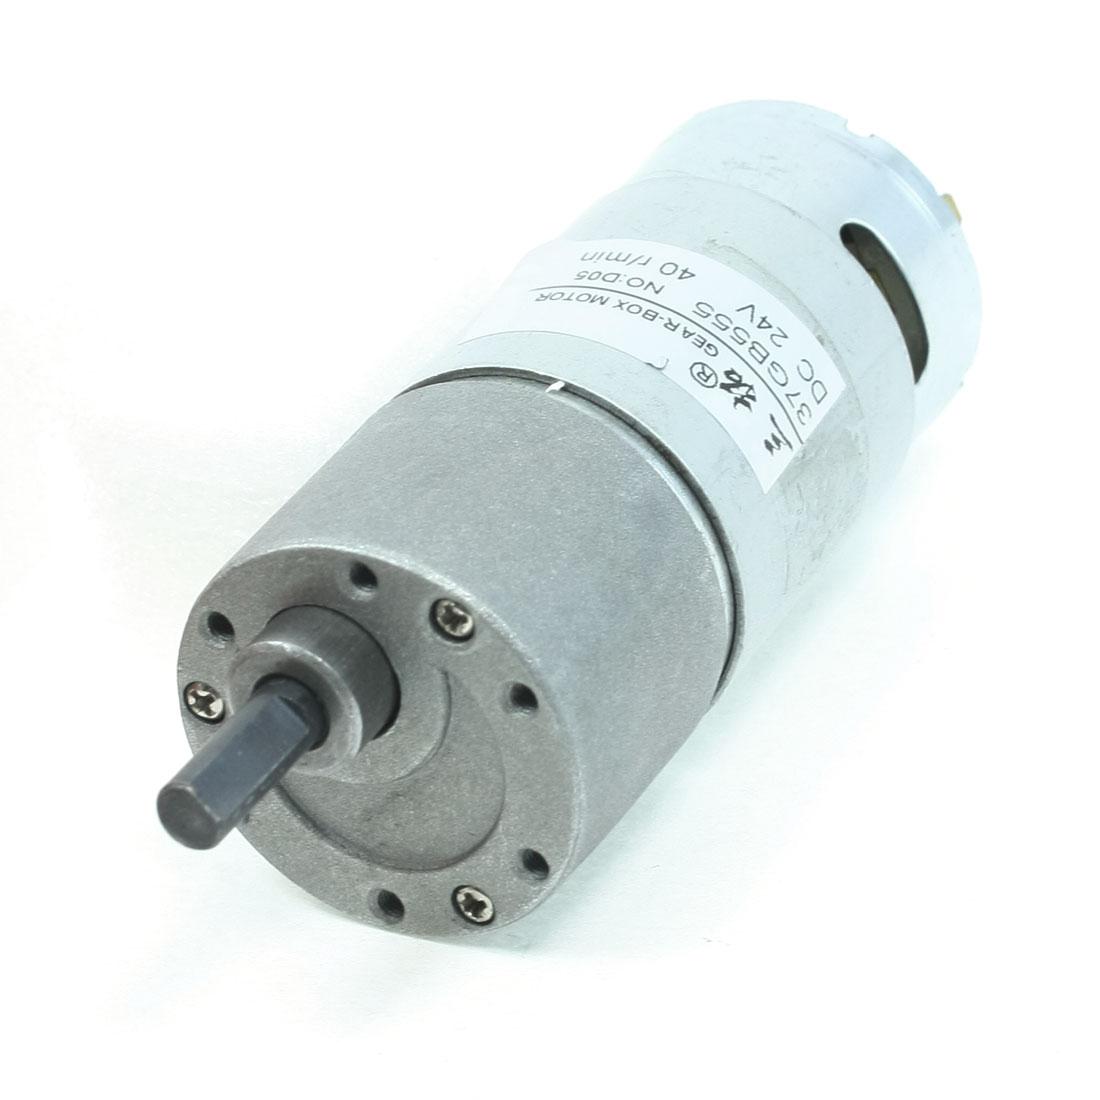 Output 40RPM DC24V 6mm Shaft Speed Reducer Round DC Gear Motor